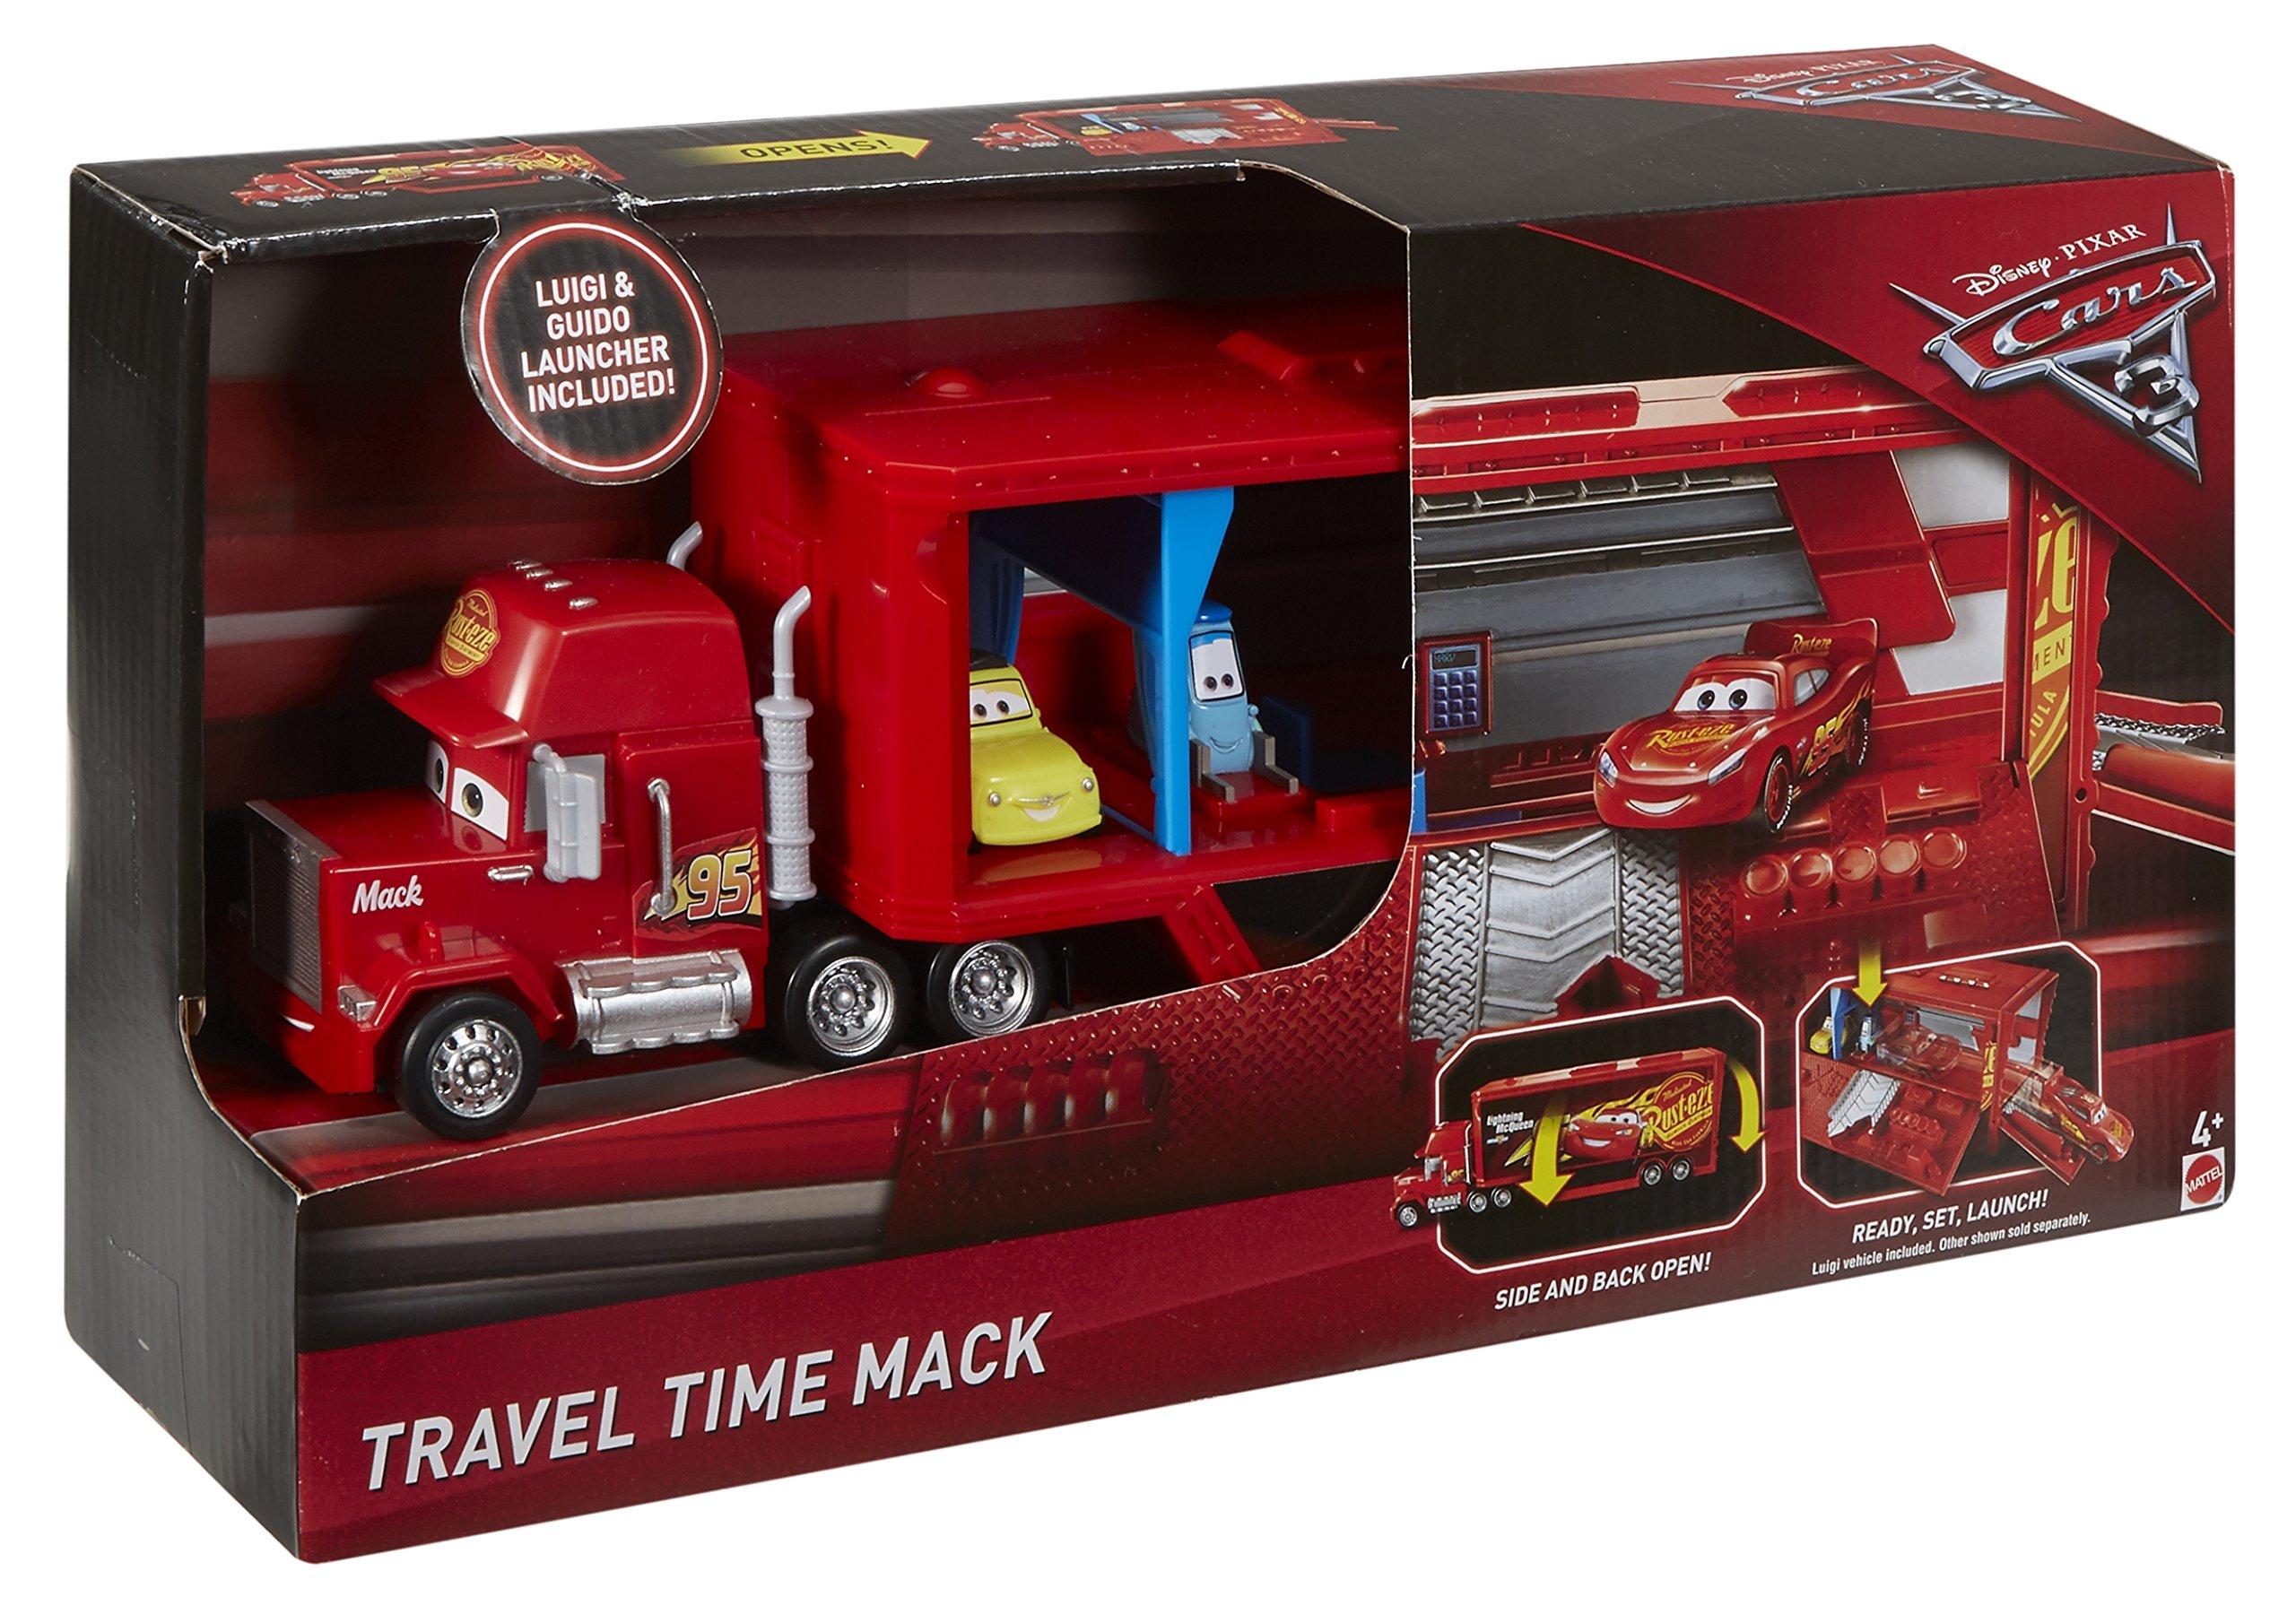 Disney Pixar Cars 3 Travel Time Mack Playset by Disney (Image #9)